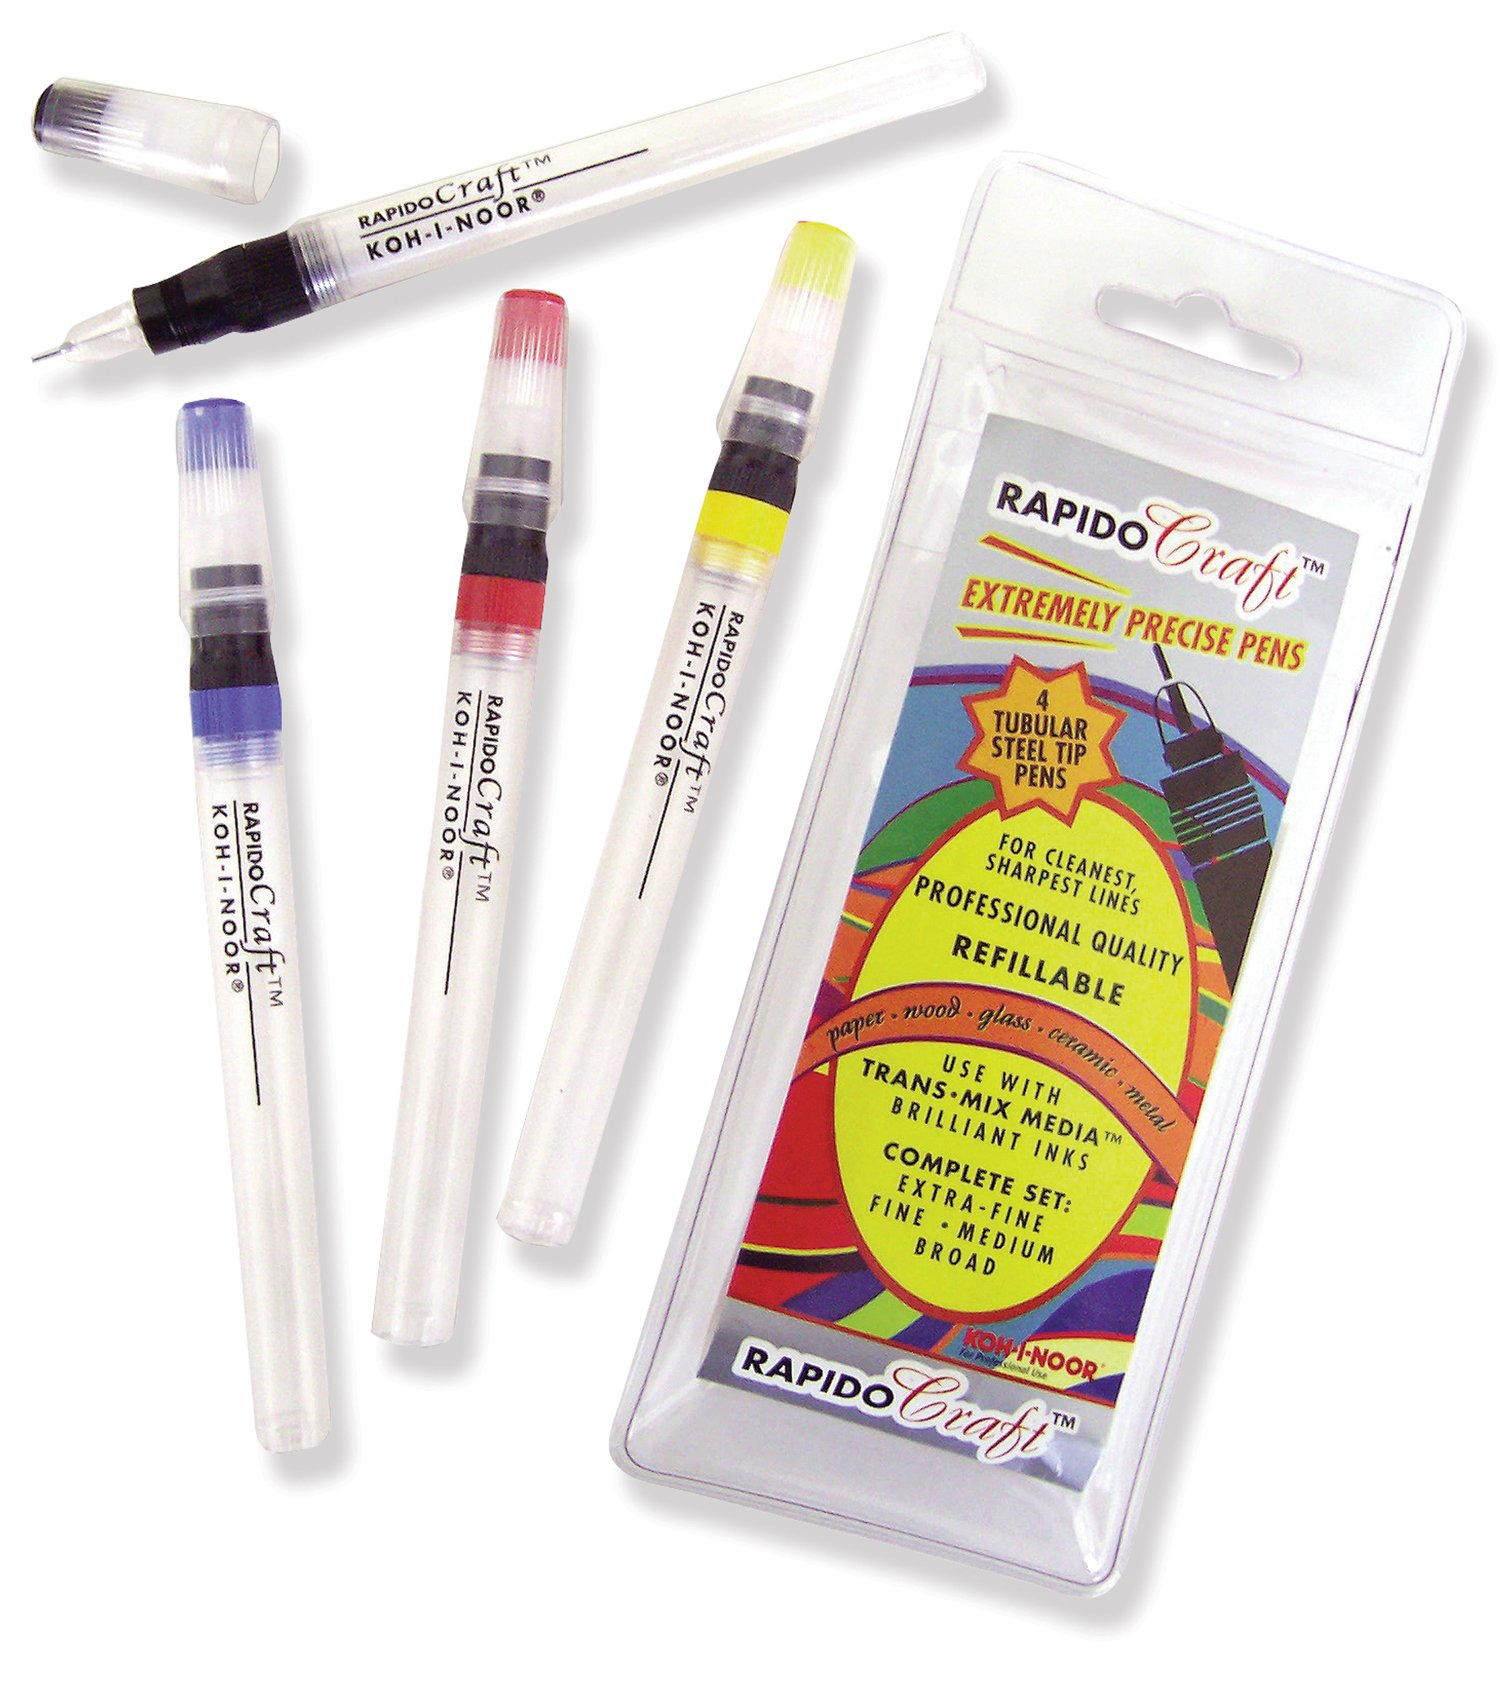 Koh-I-Noor RapidoCraft 4-Pen Set, Extra-Fine, Fine, Medium and Broad Points, 1 Set (3065.SET) by Koh-I-Noor